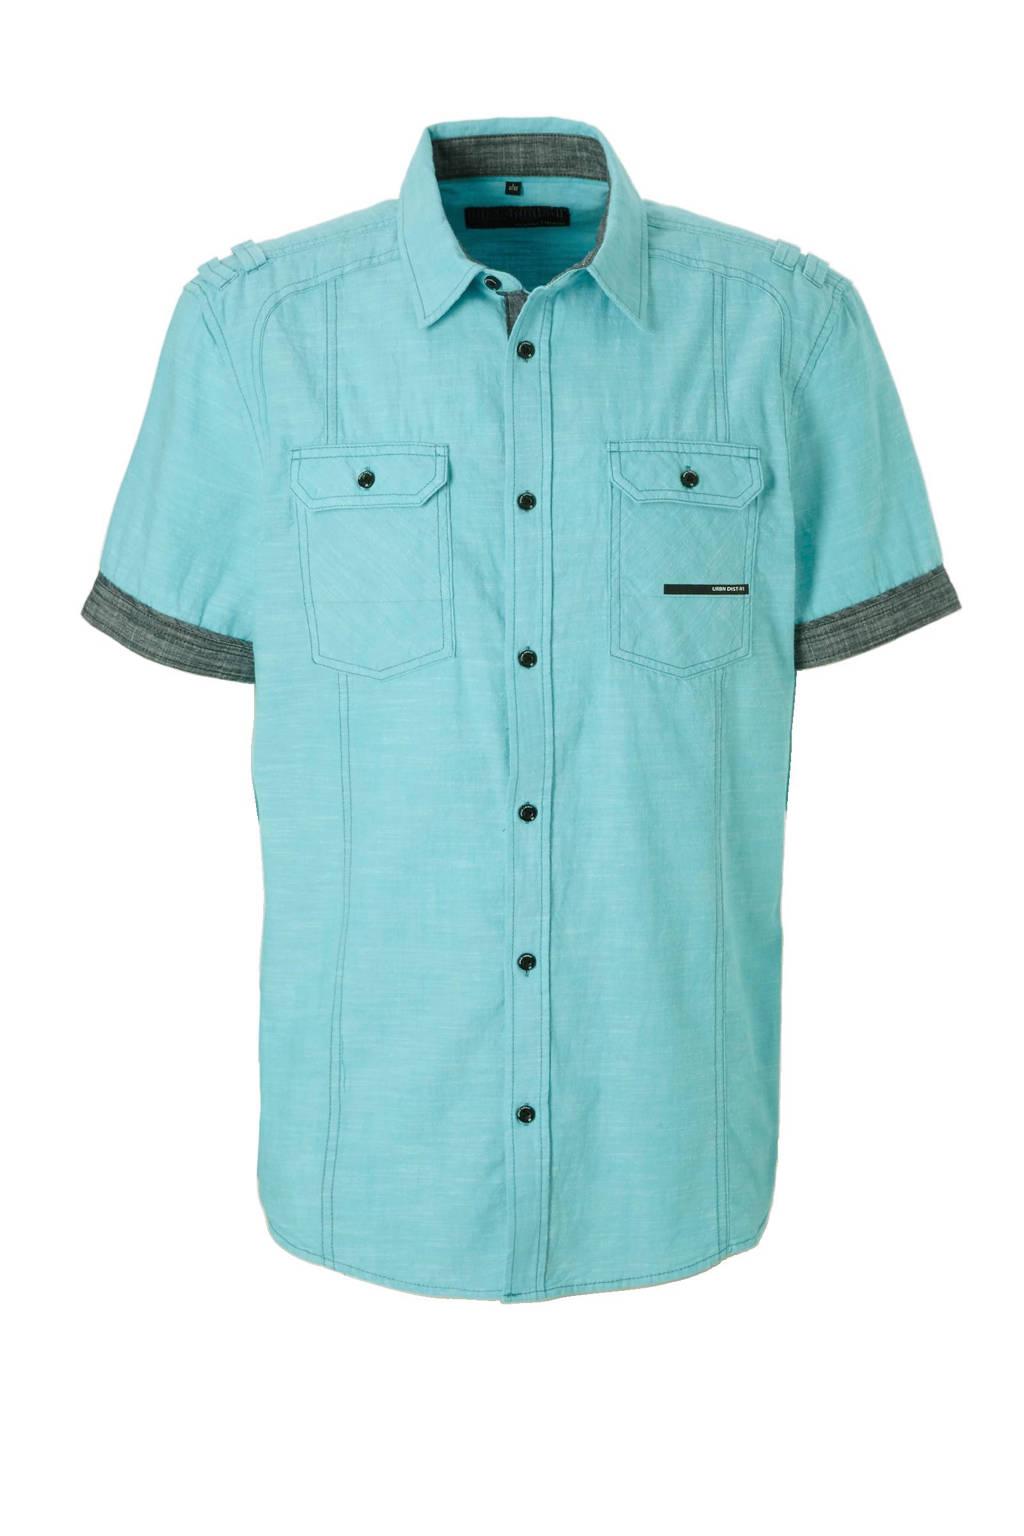 Mintgroen Heren Overhemd.C A Angelo Litrico Regular Fit Overhemd Mintgroen Wehkamp